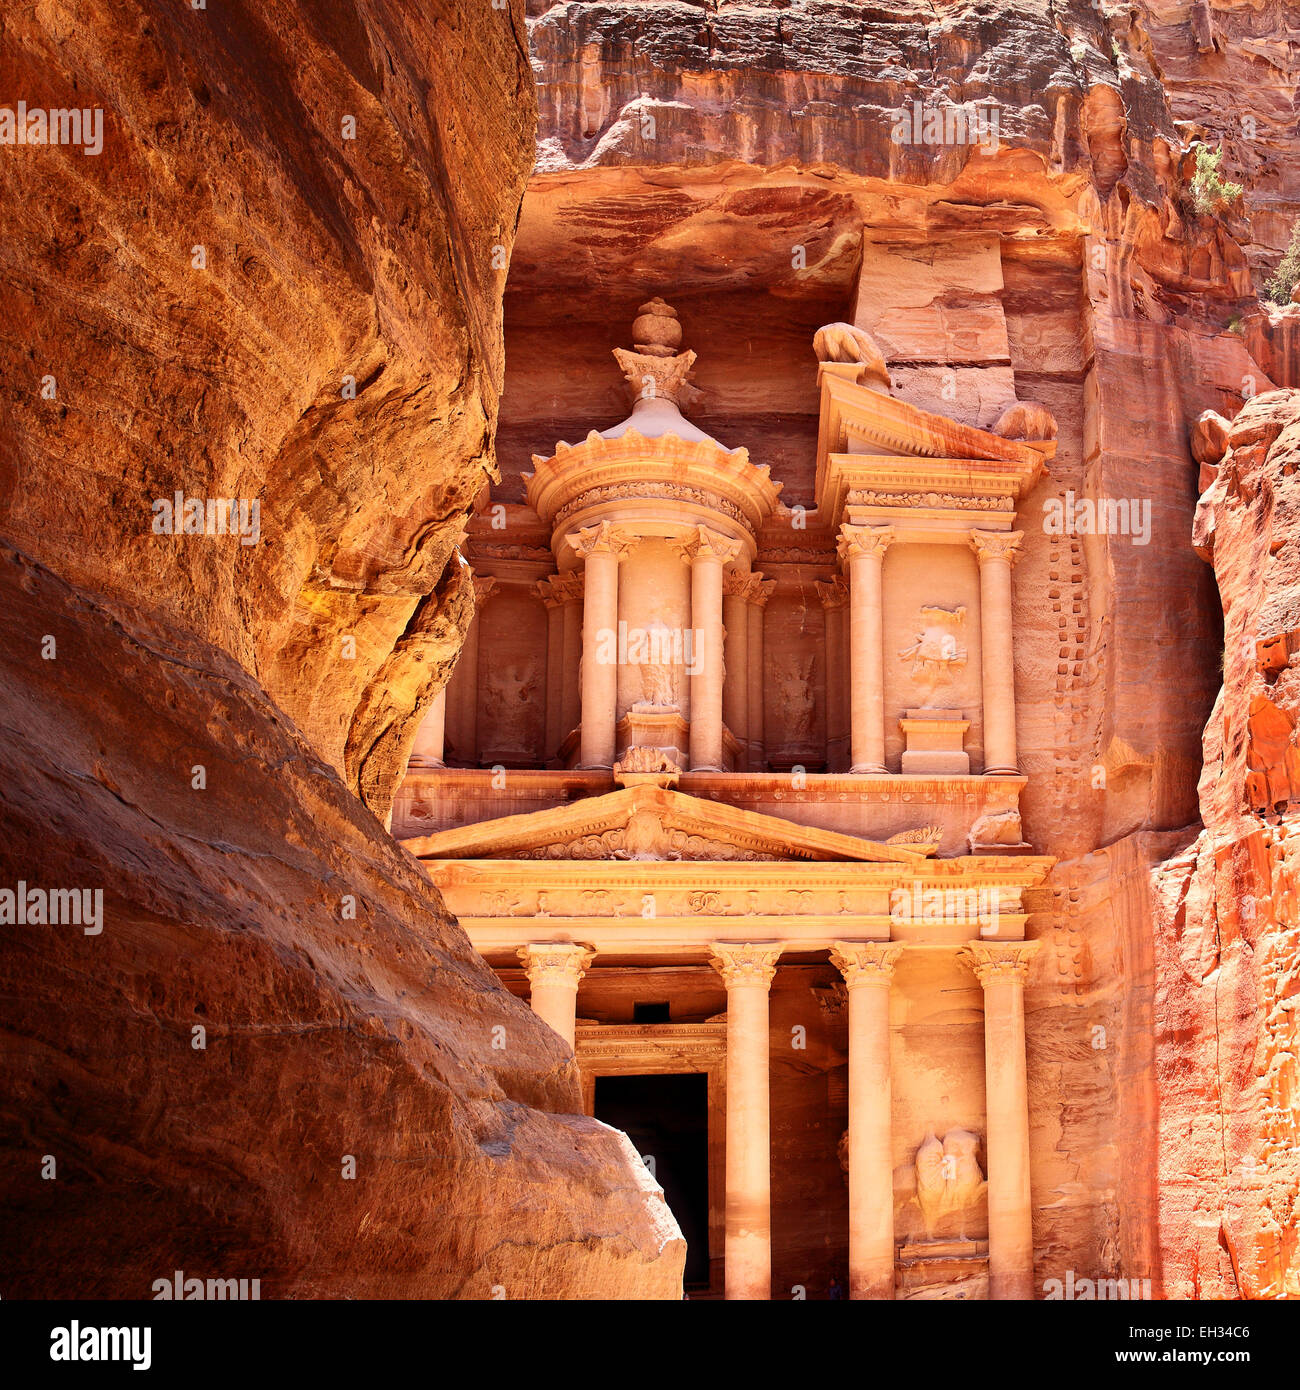 Trésor de Petra (Al khazneh), Jordanie Photo Stock